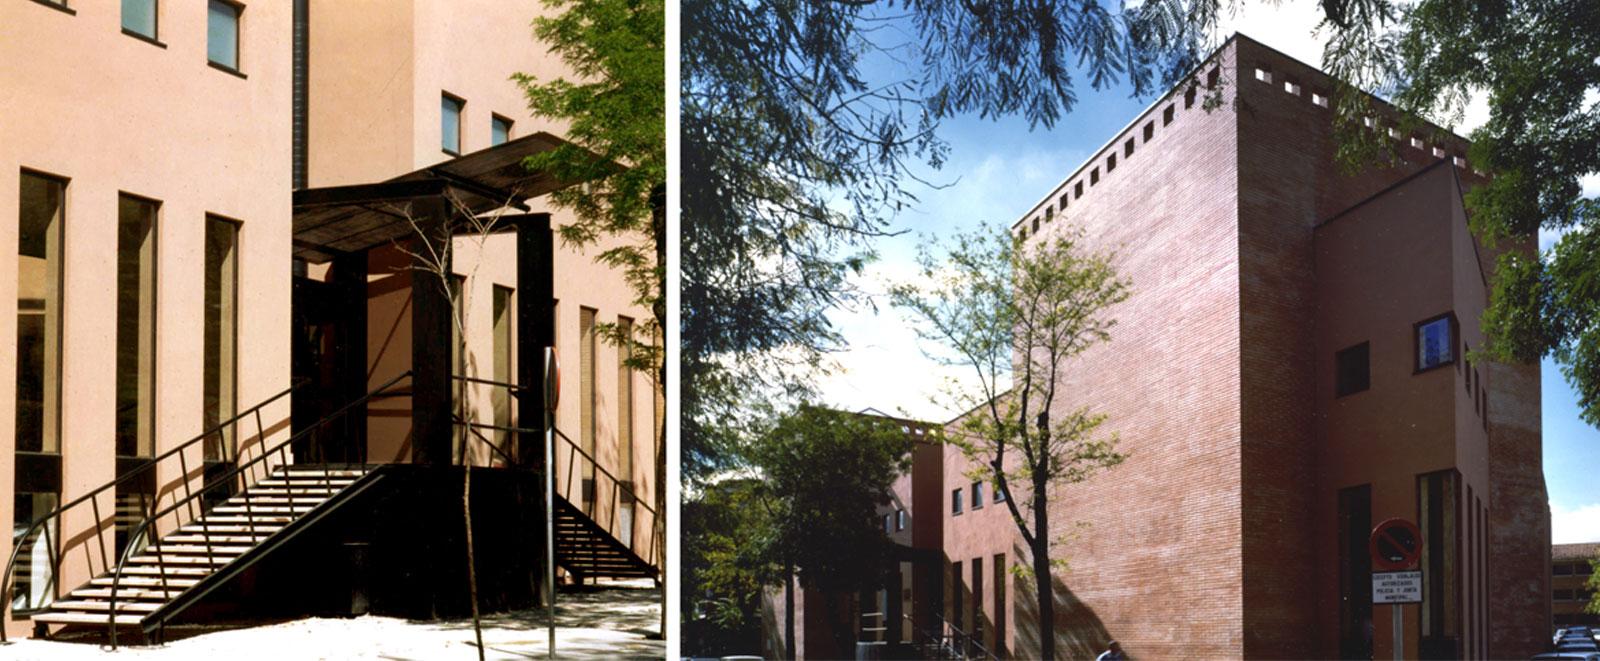 Allendearquitectos.com